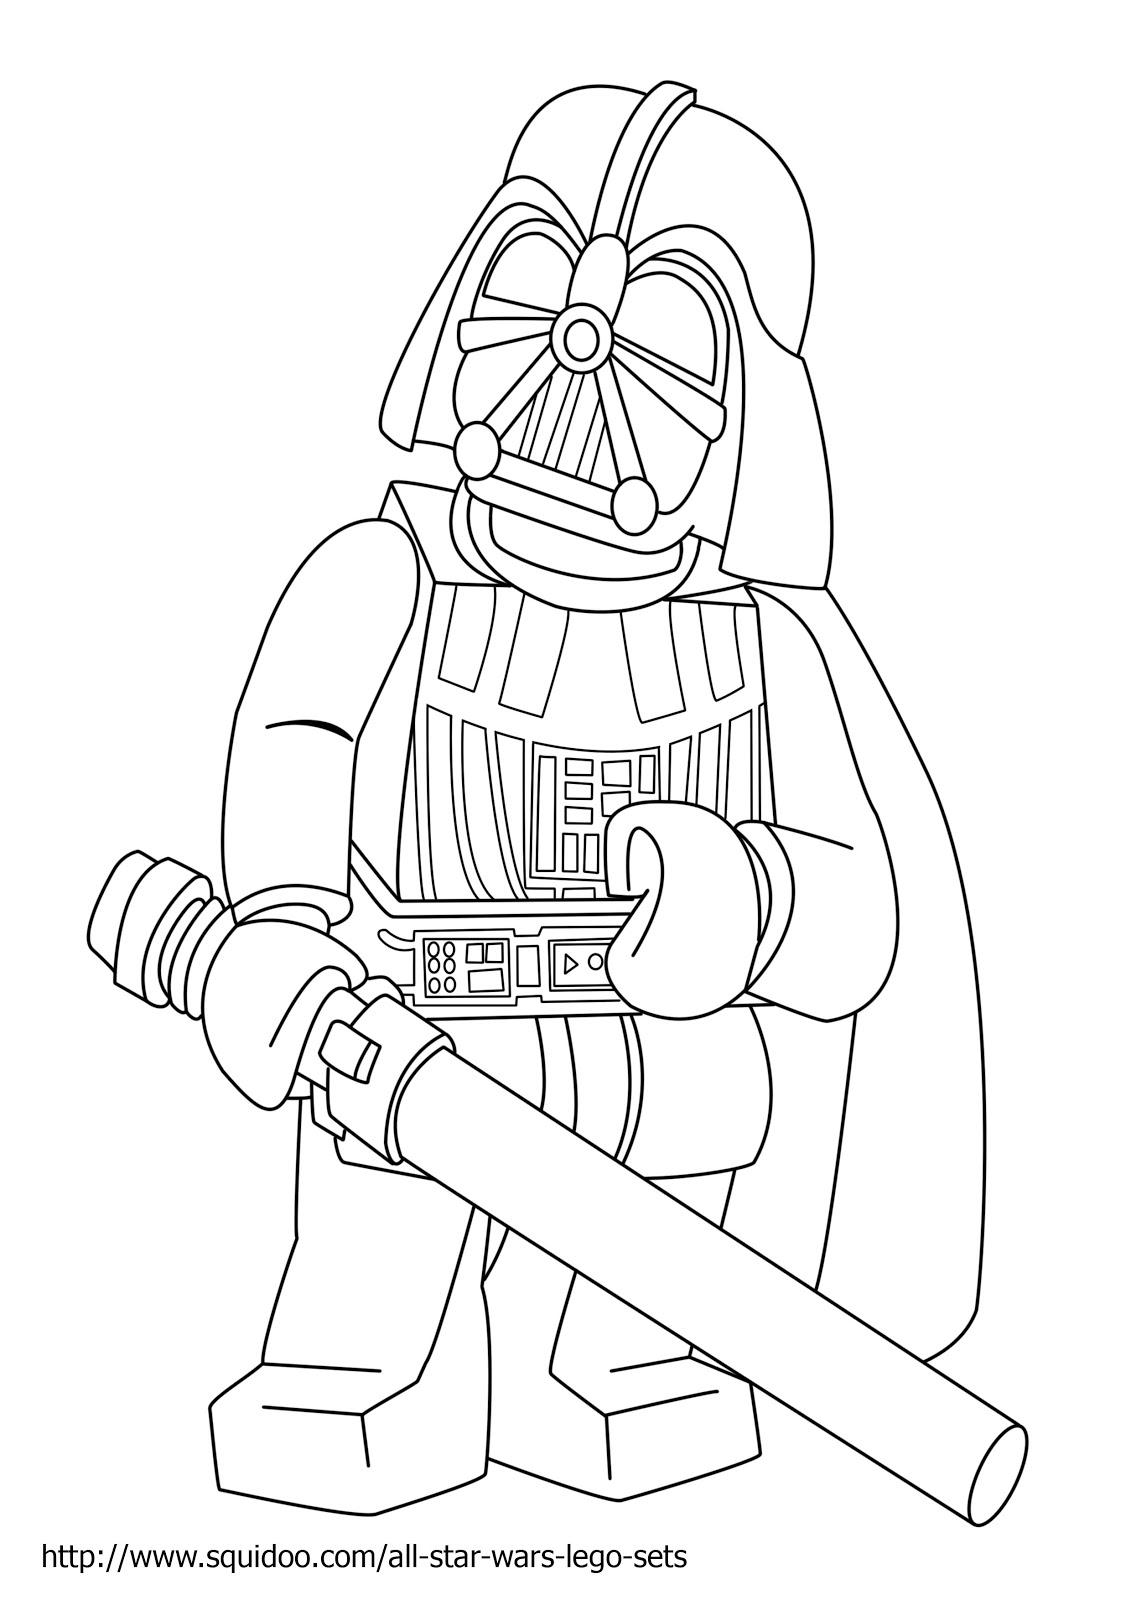 Dibujos star wars - dibujos para colorear - imagixs